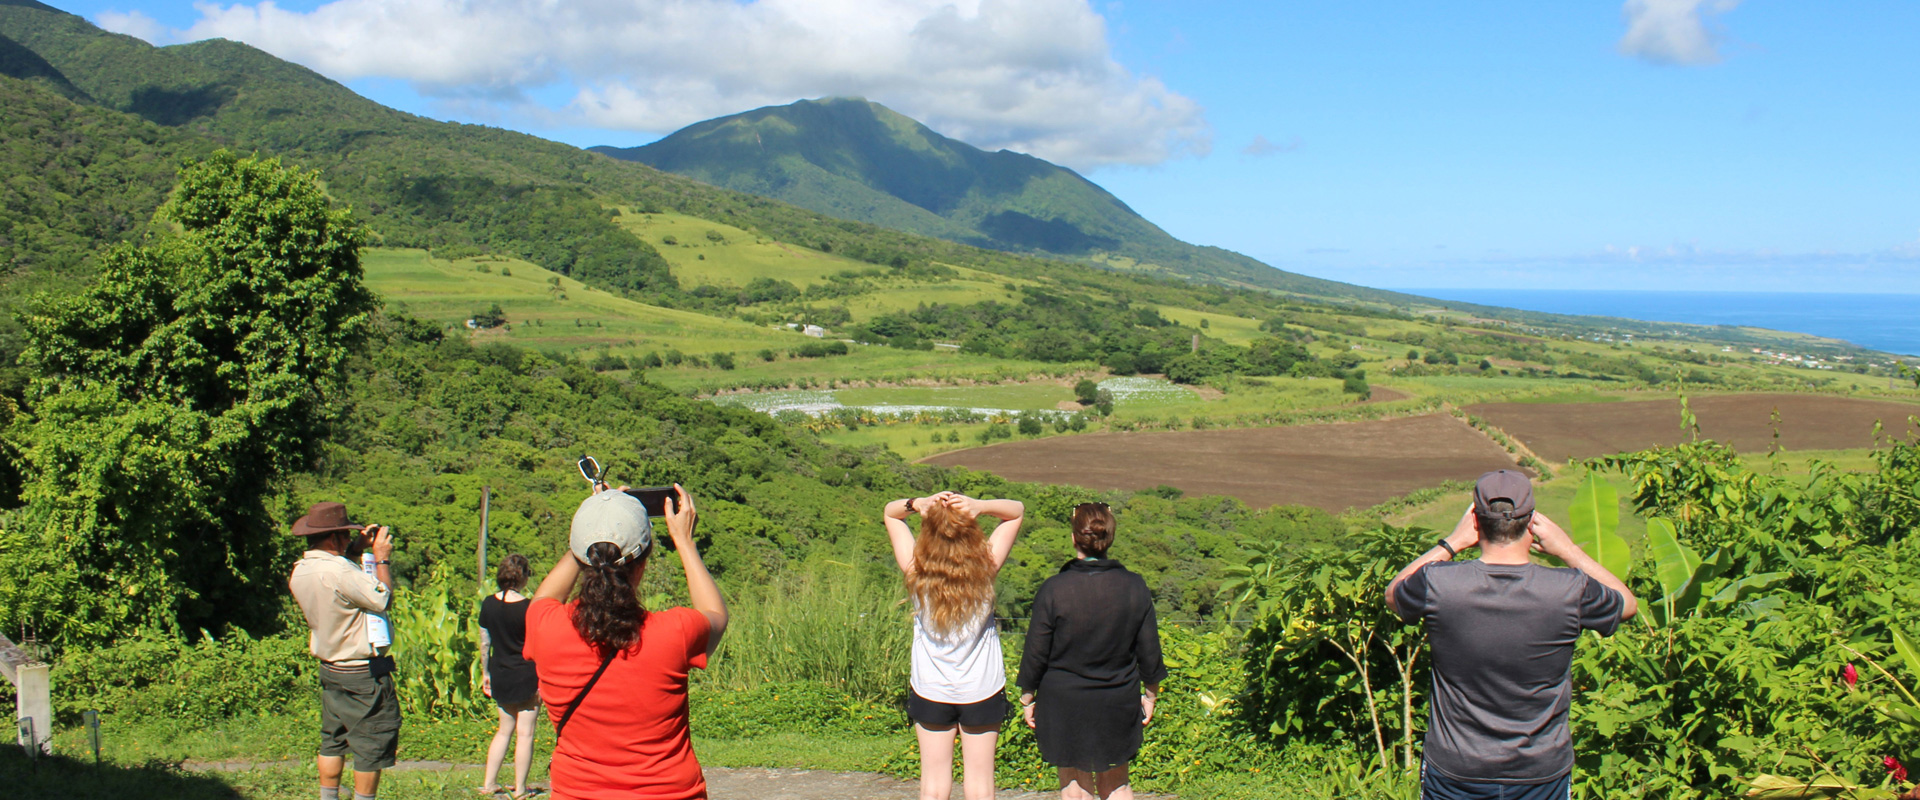 Group sightseeing on St. Kitts Nature Tour